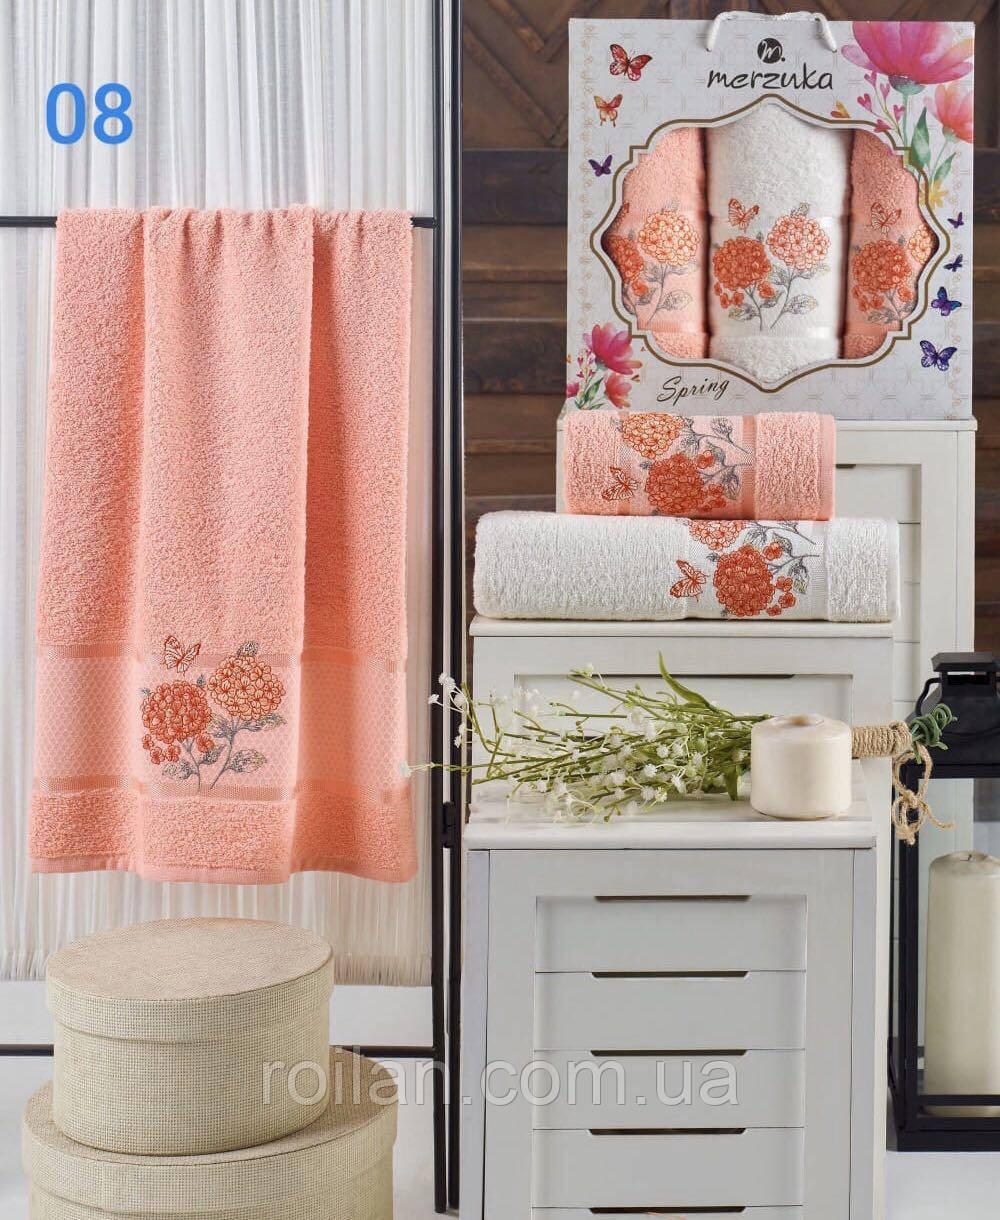 Набор полотенец Spring3ка